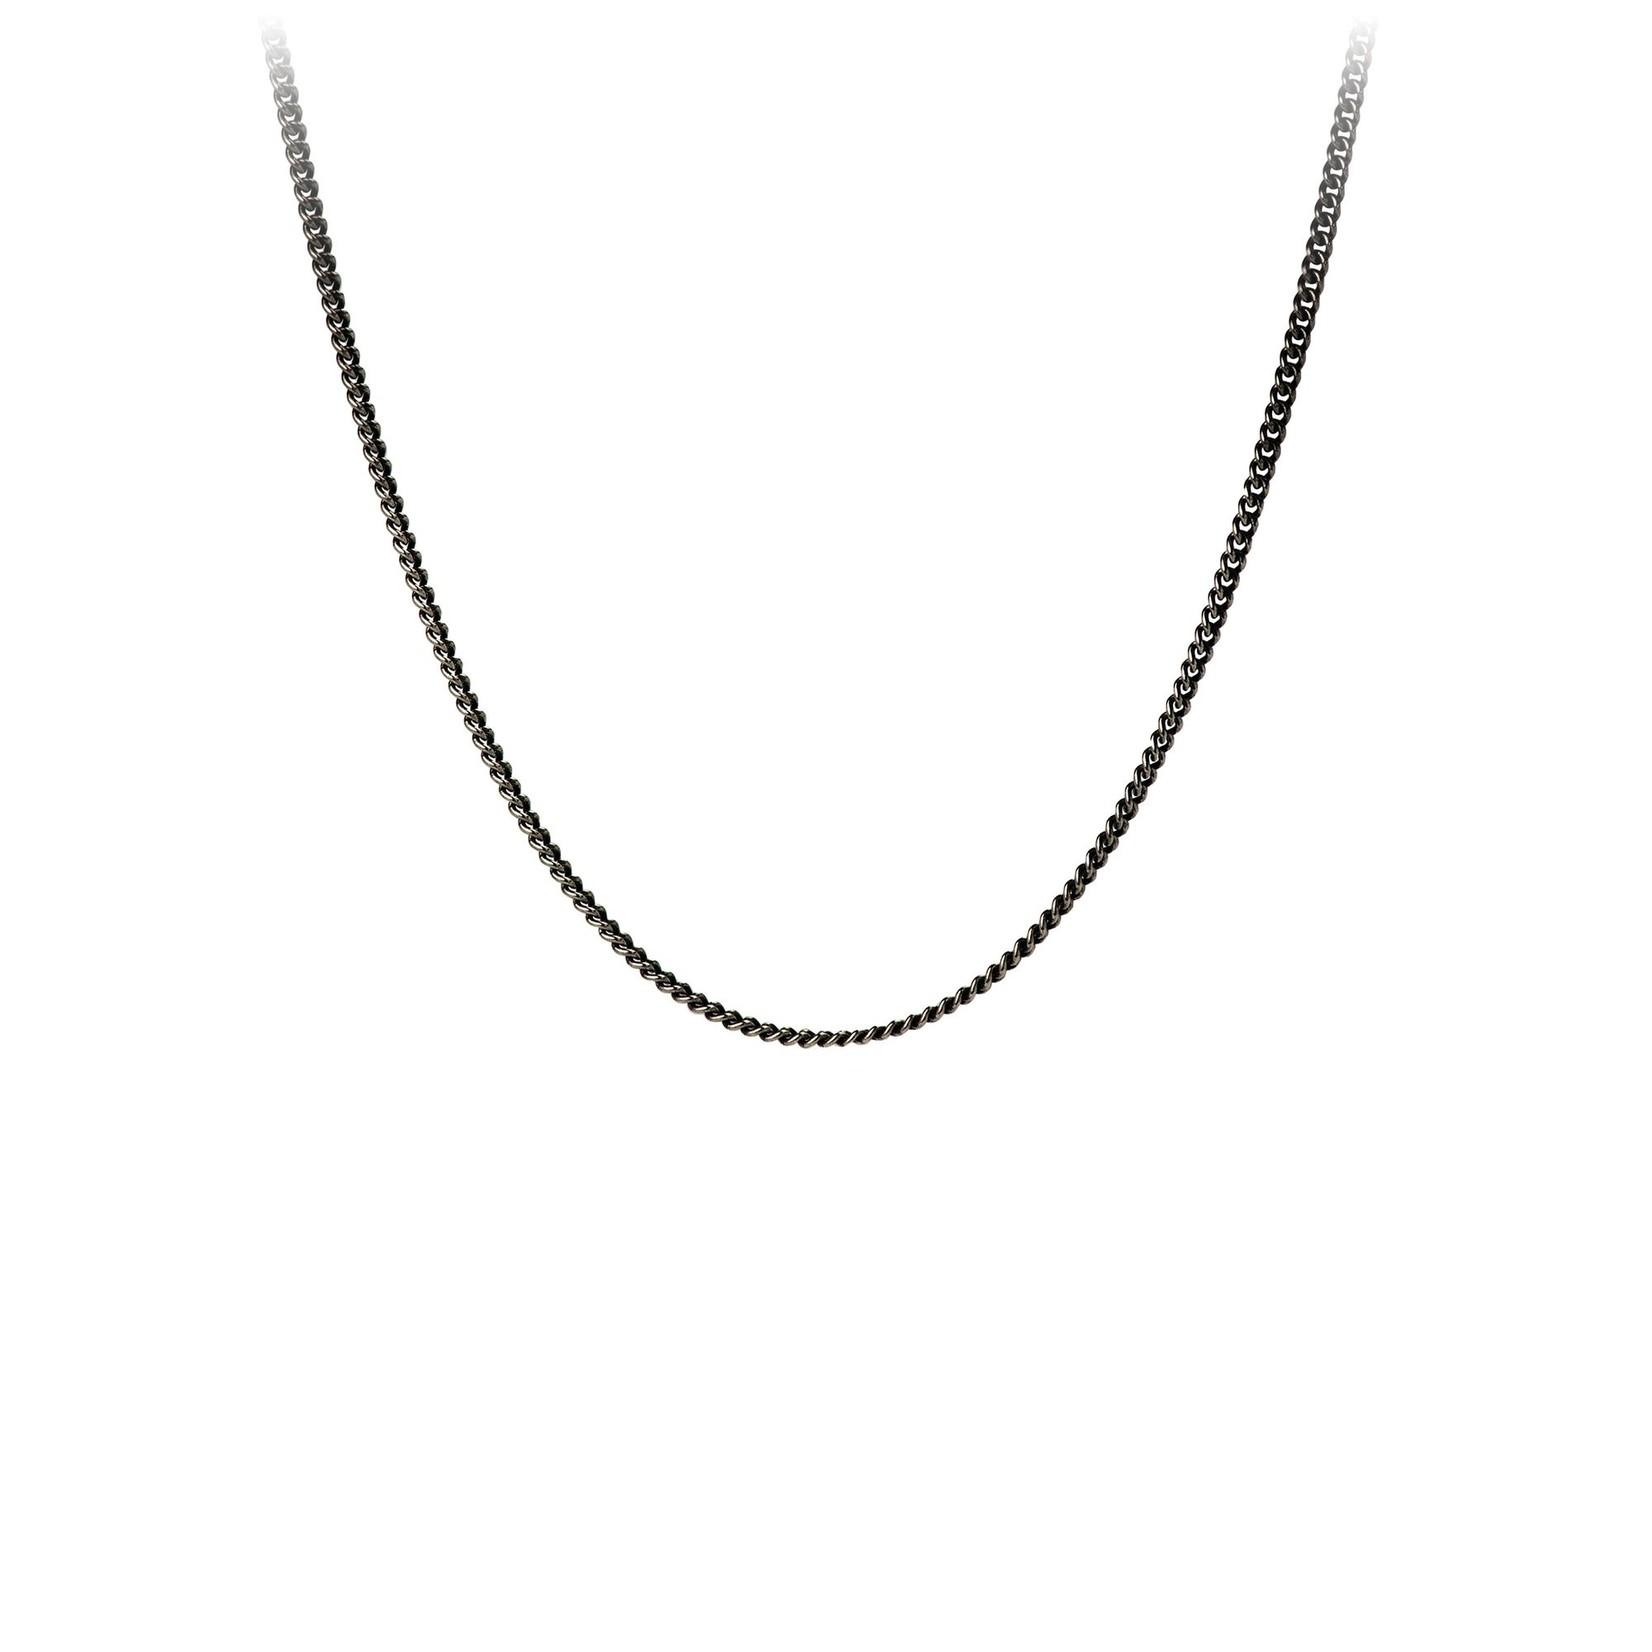 Pyrrha Black Sterling Silver Fine Curb Chain